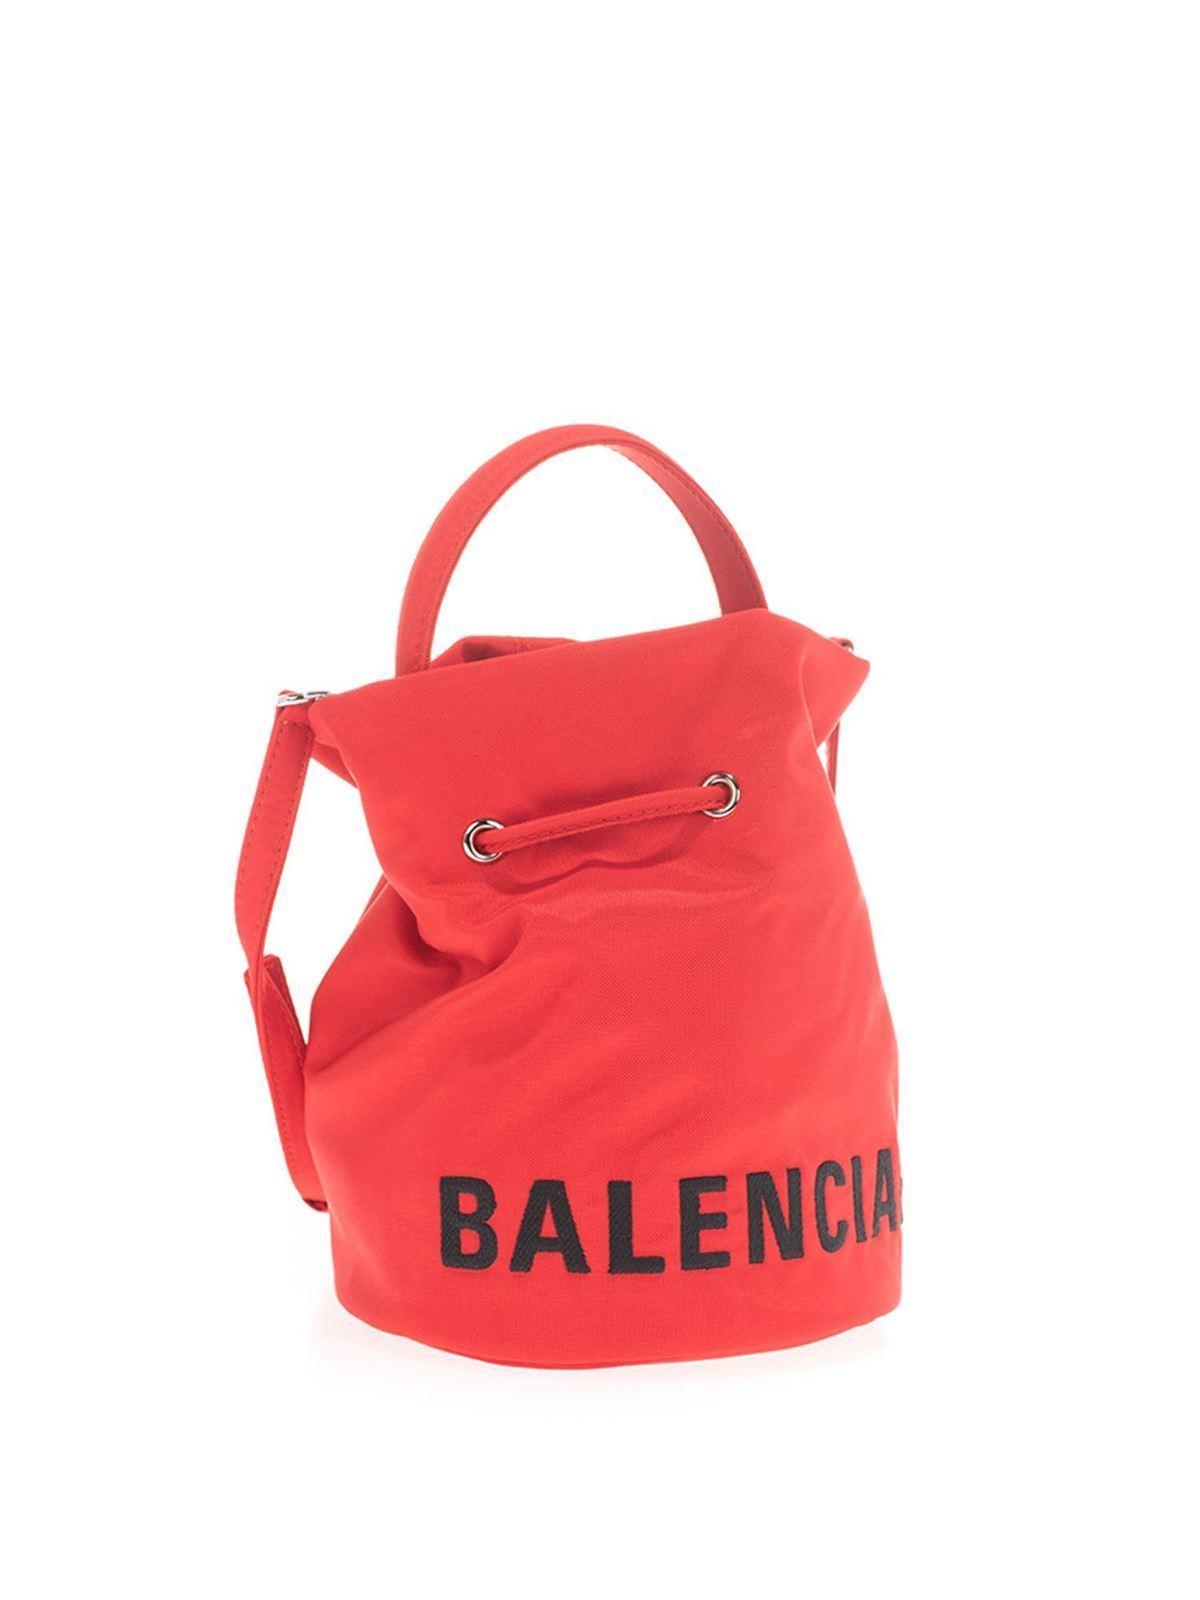 Balenciaga Small Wheel Satchel Bag Bucket Bags 619458h854n6460